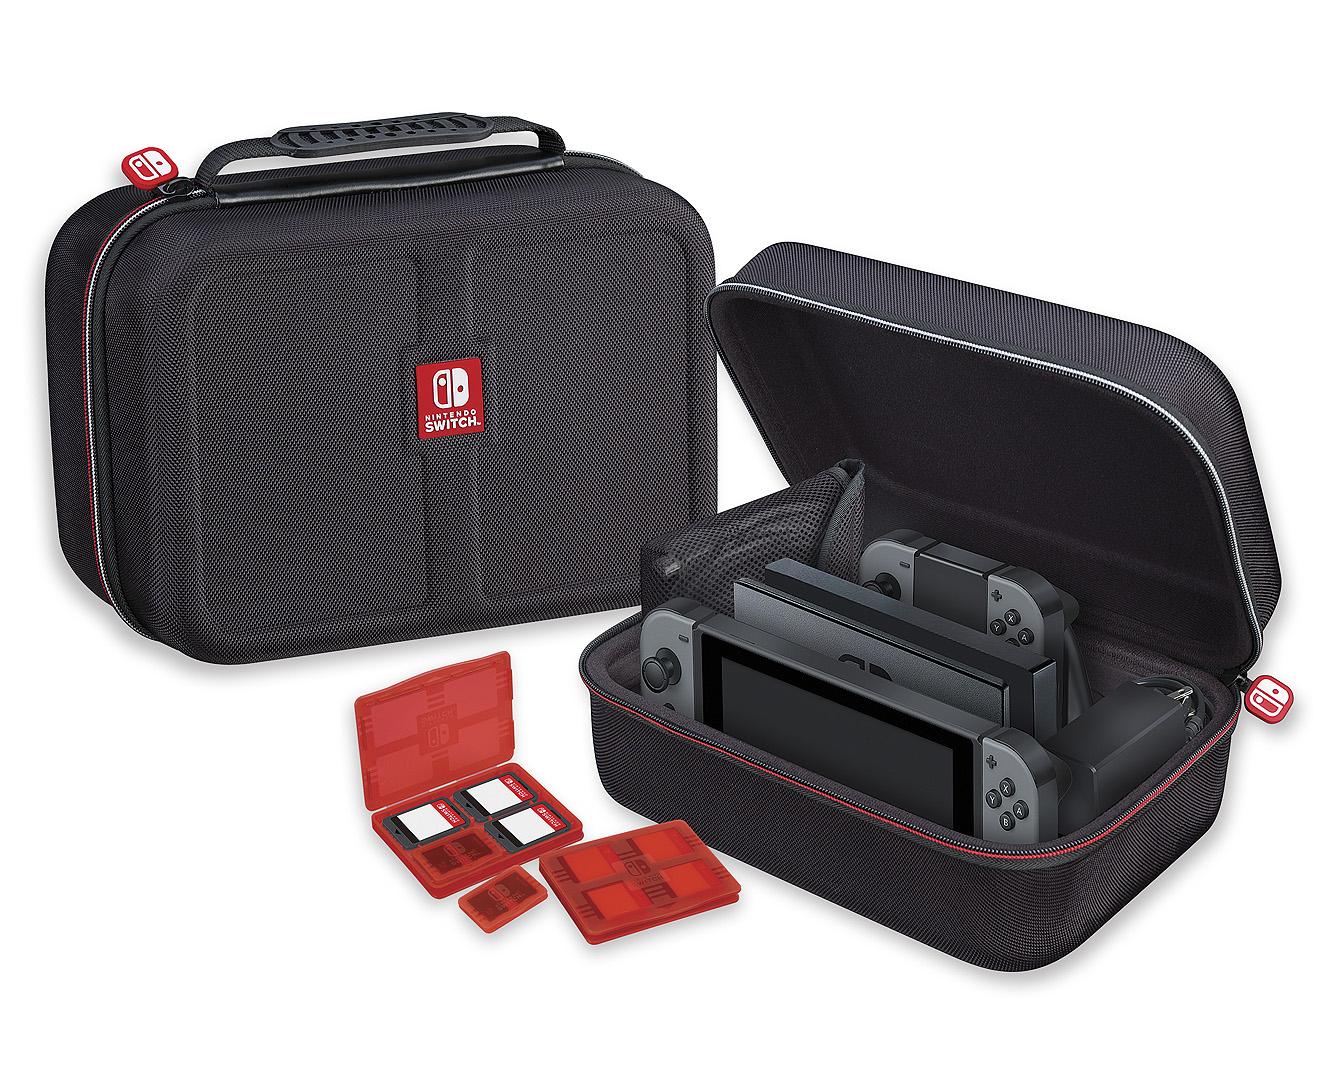 68cedc2d0d91 RDS Nintendo Switch Traveller Deluxe Travel Case - Black